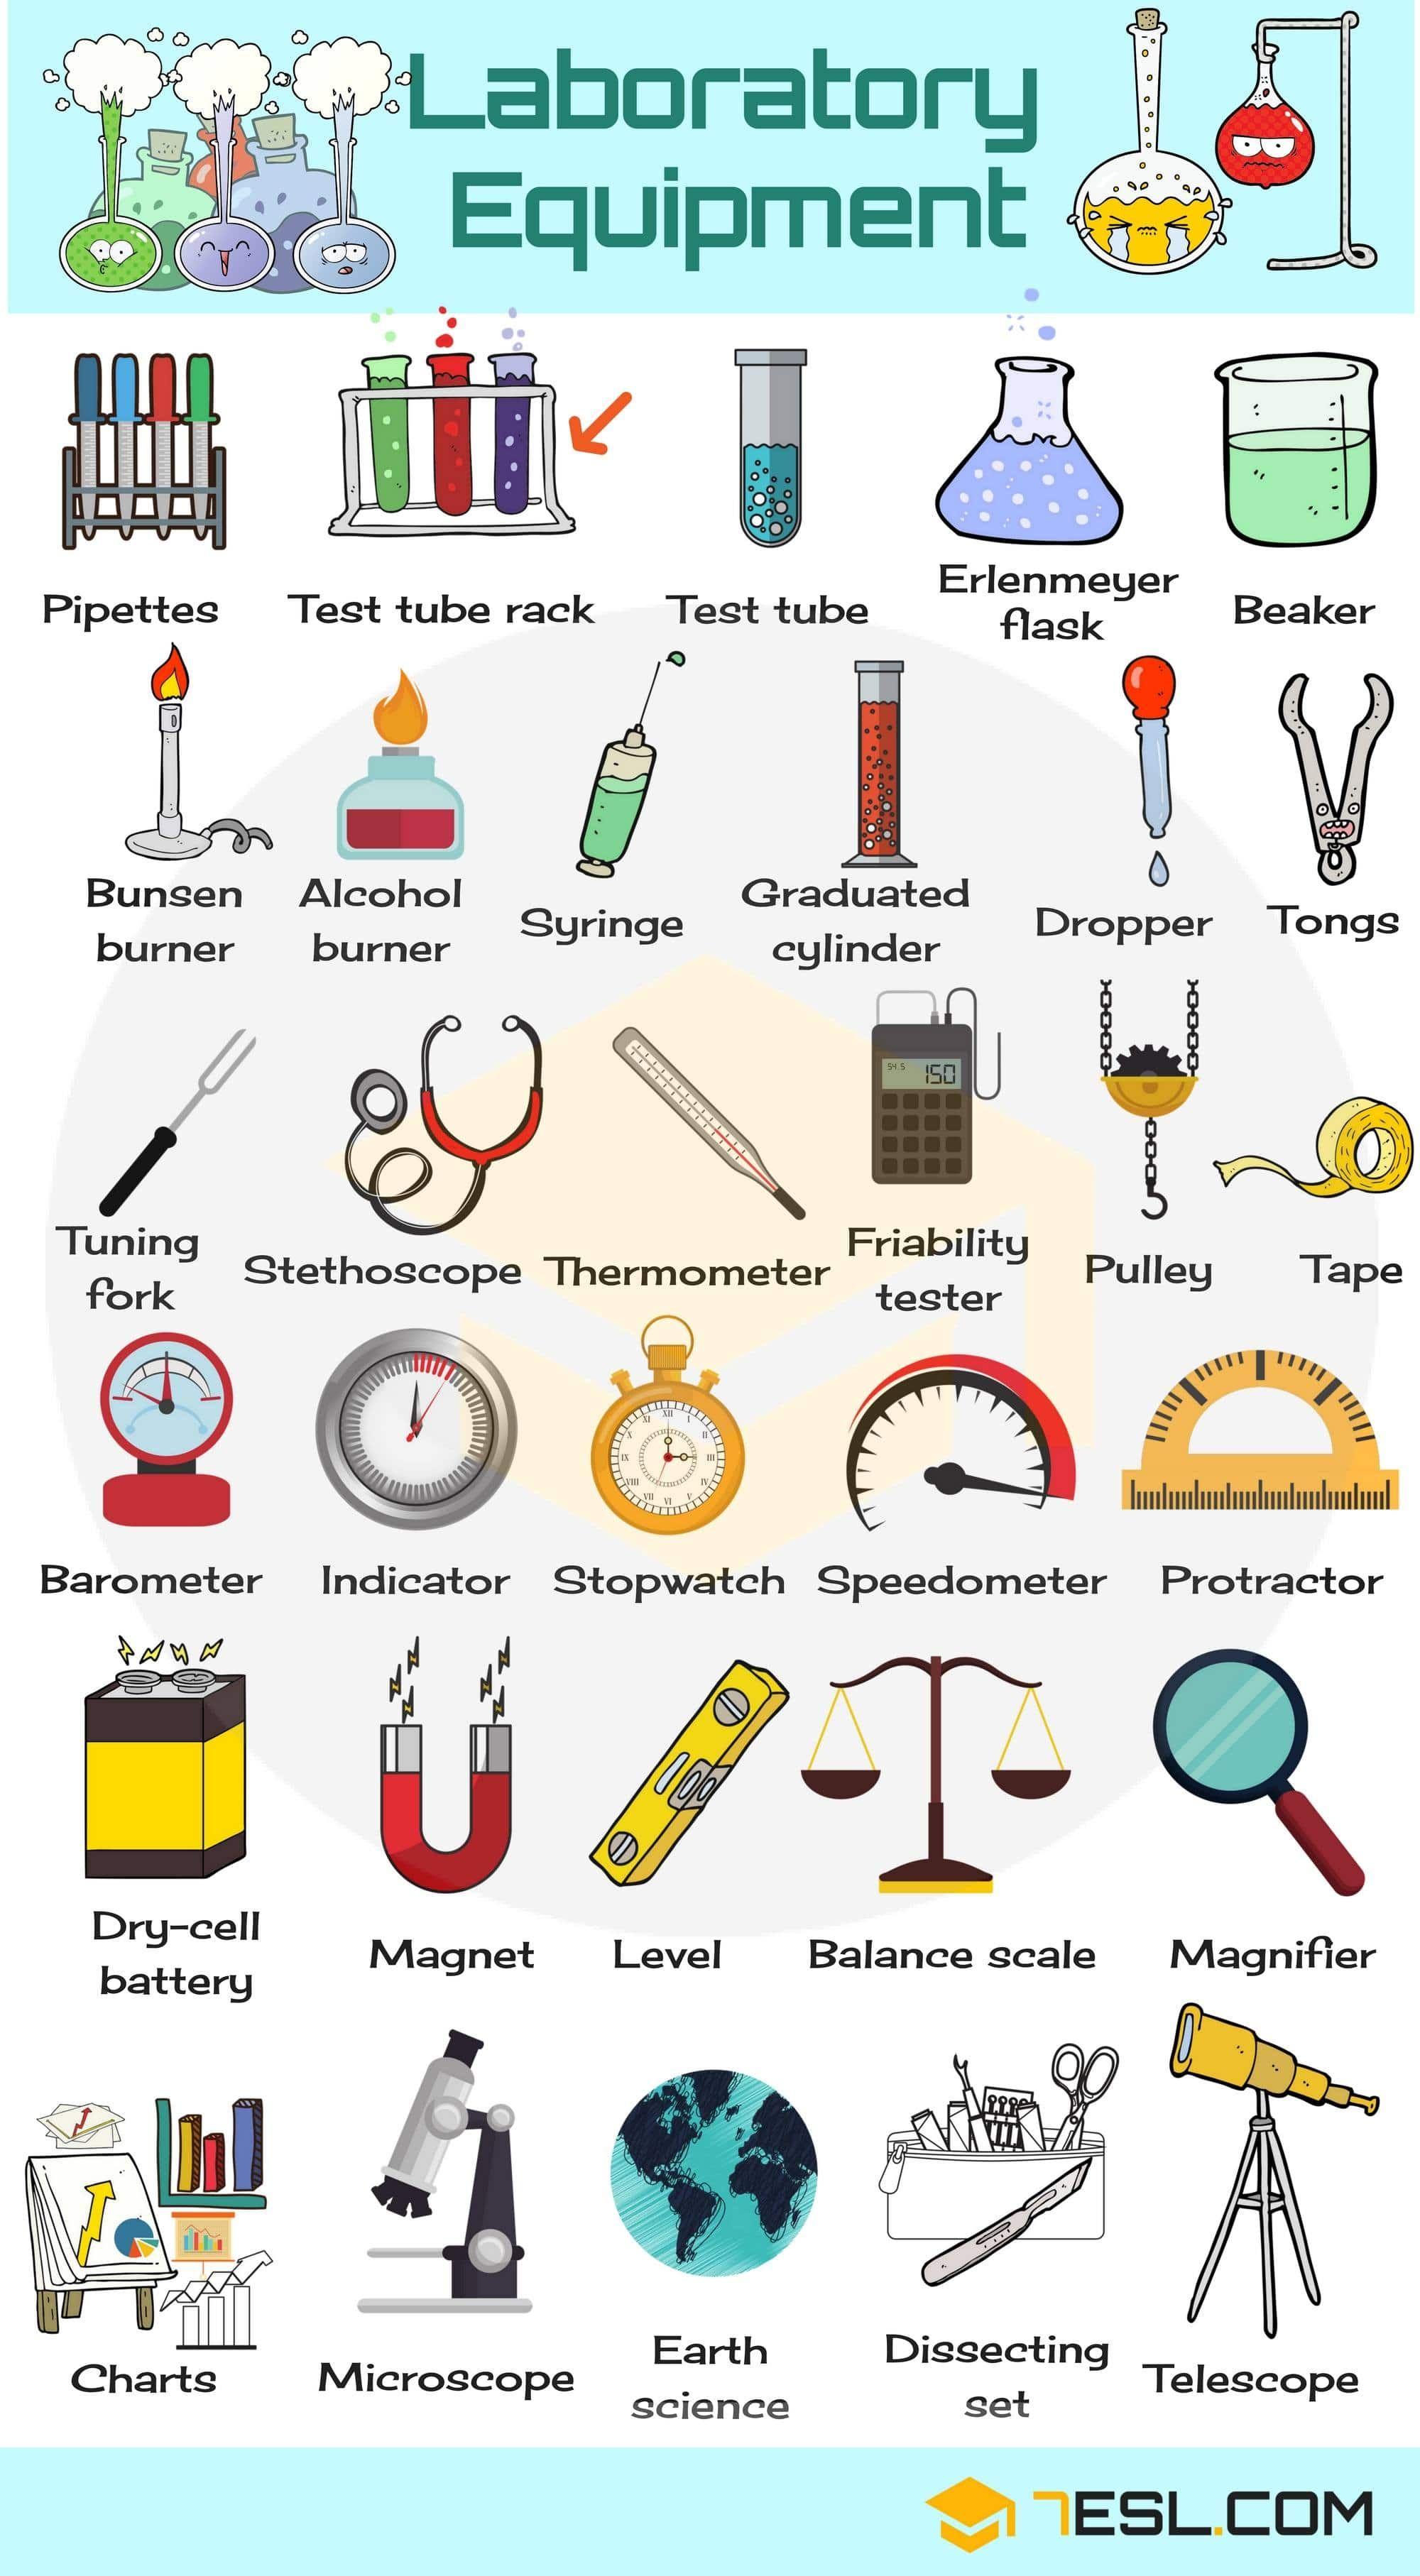 Laboratory Equipment Vocabulary In English Pinterest Drybatterycelldiagramjpg